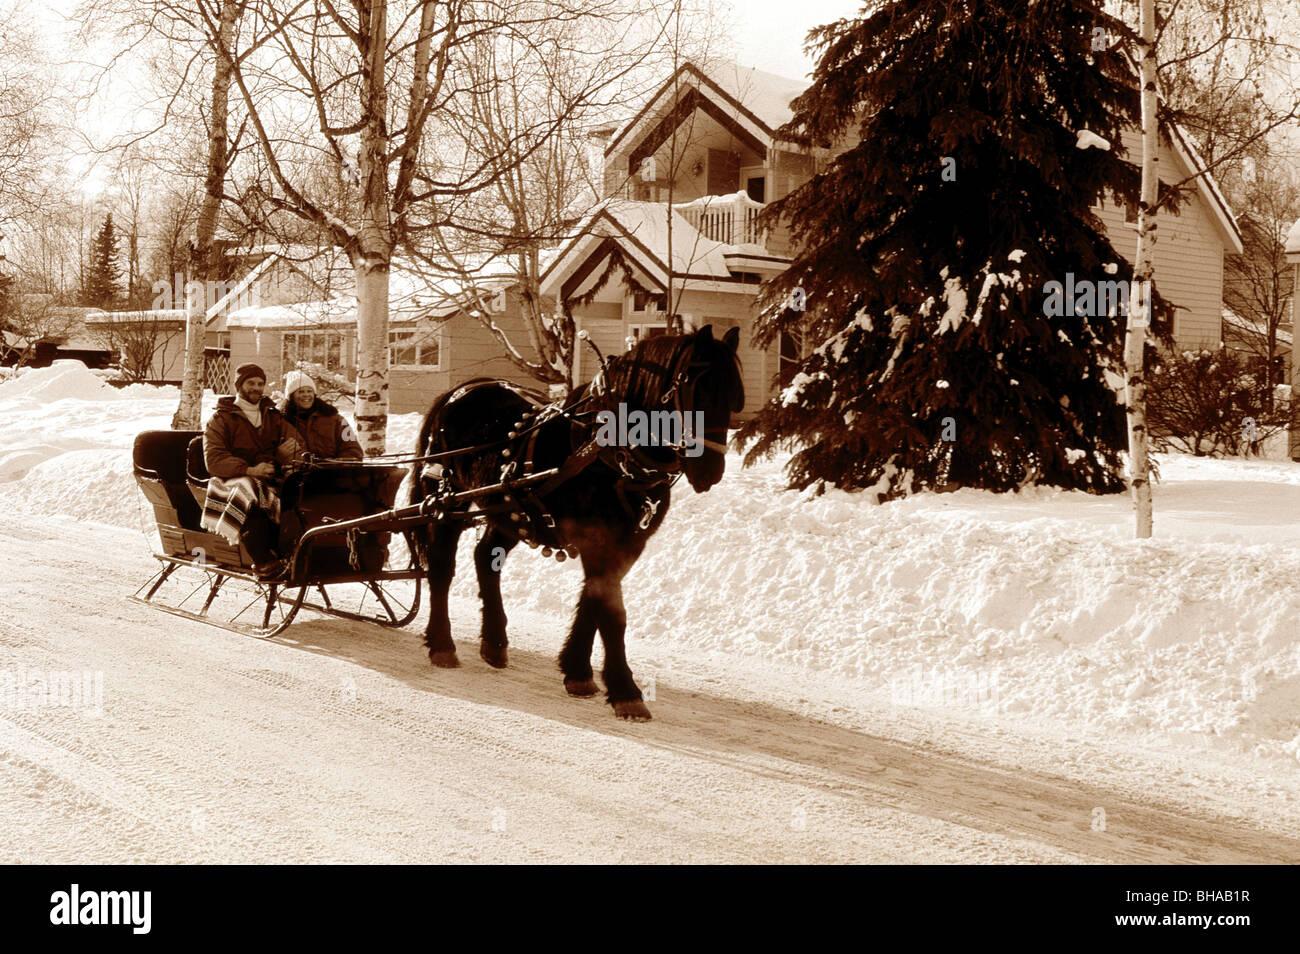 sleigh photos sleigh images alamy. Black Bedroom Furniture Sets. Home Design Ideas